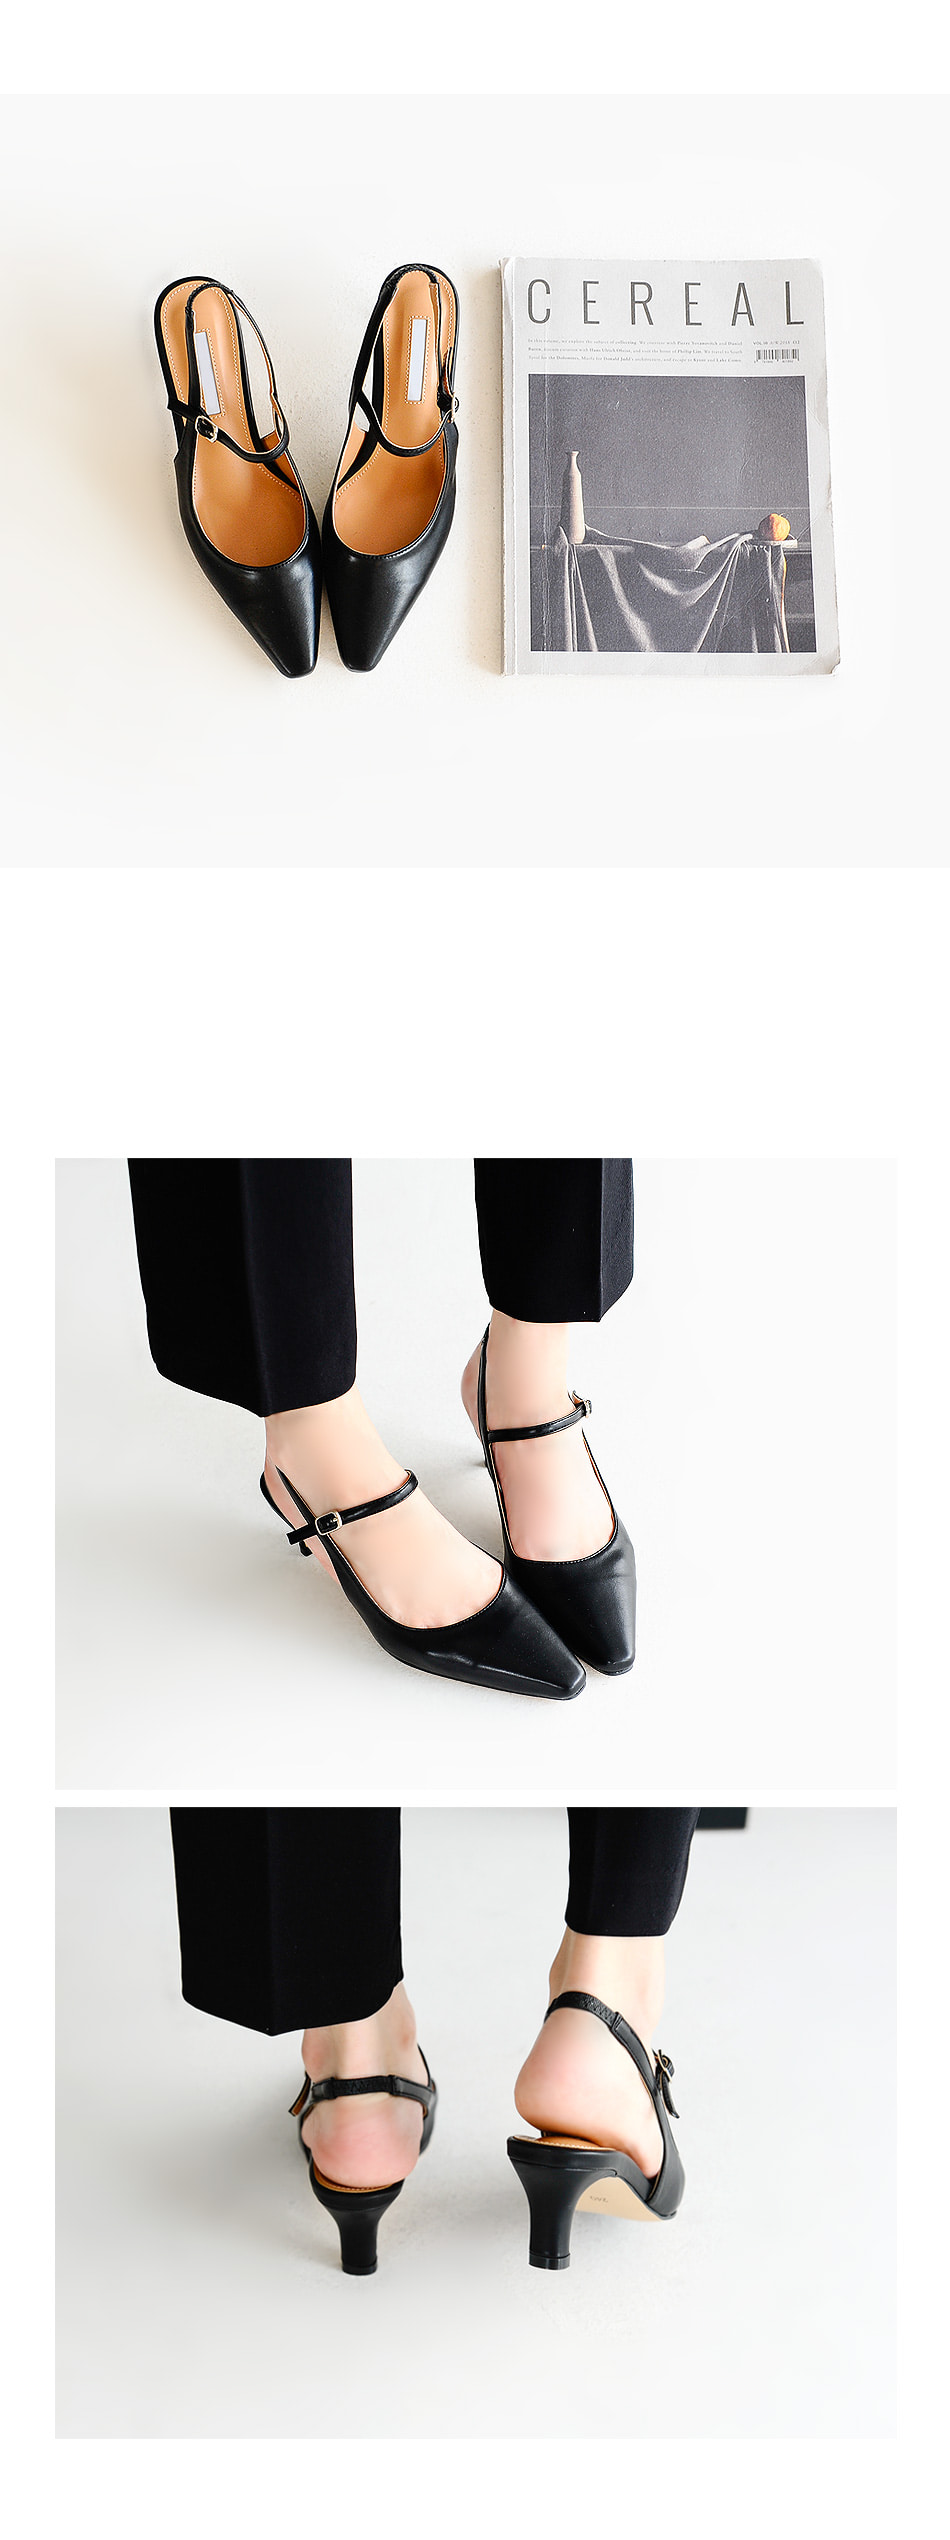 Laberoon Slingback Middle Heel 5cm